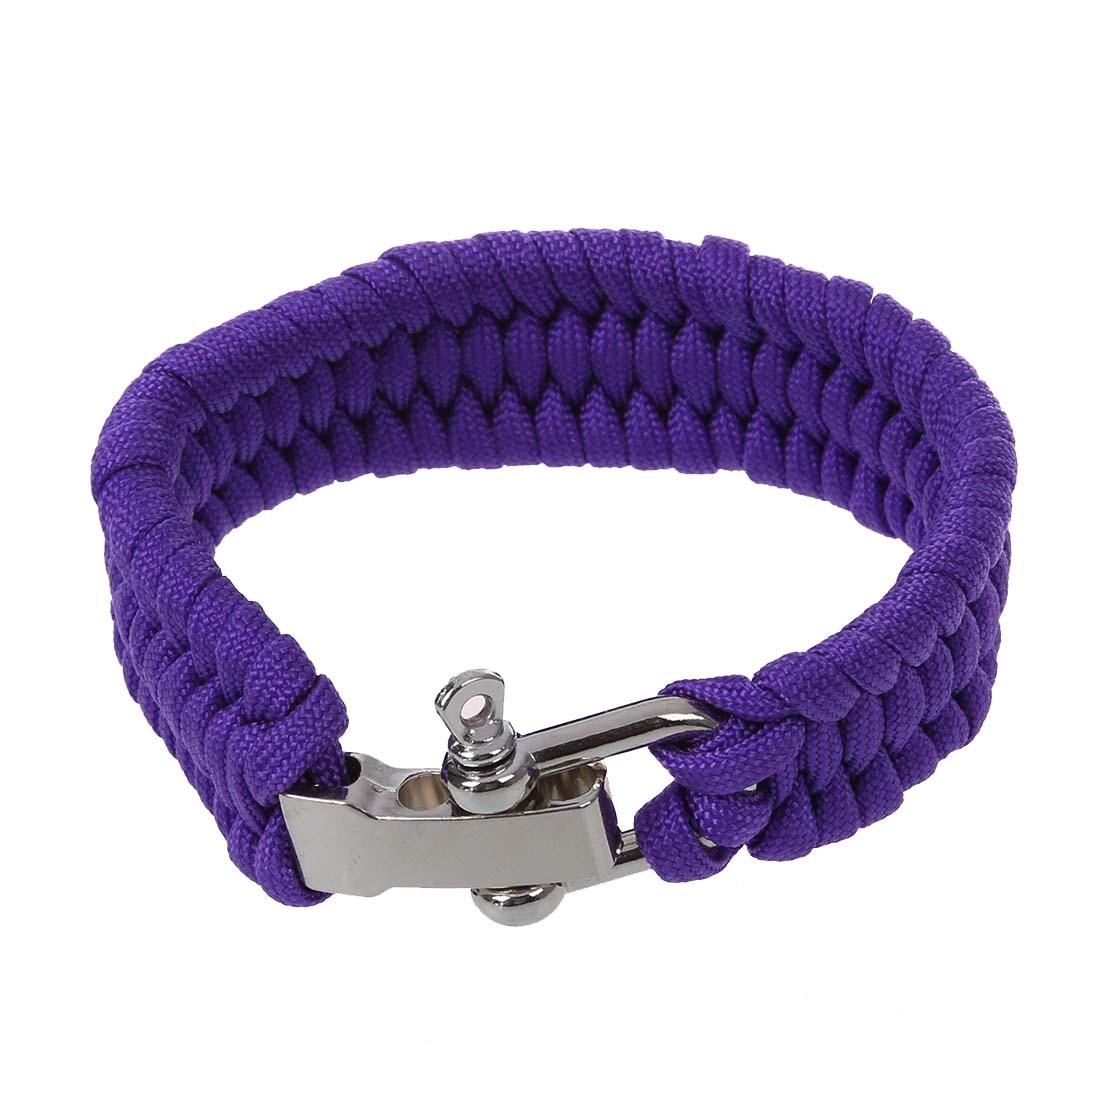 Wholesale 5pcs*7 Strand Survival Military Weave Bracelet Cord Buckle Purple Luggage & Bags